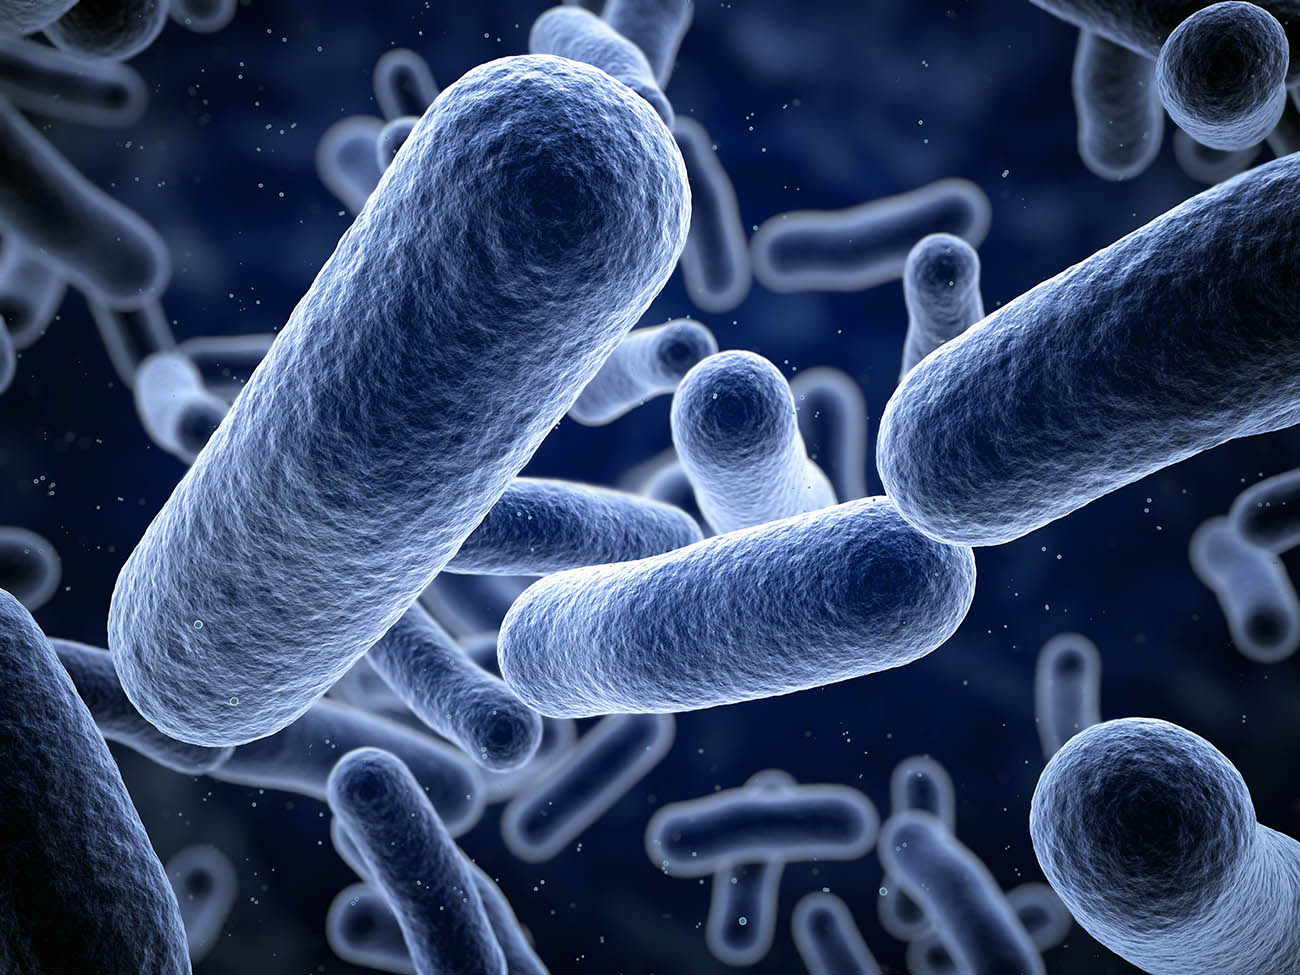 Bacteria closeup